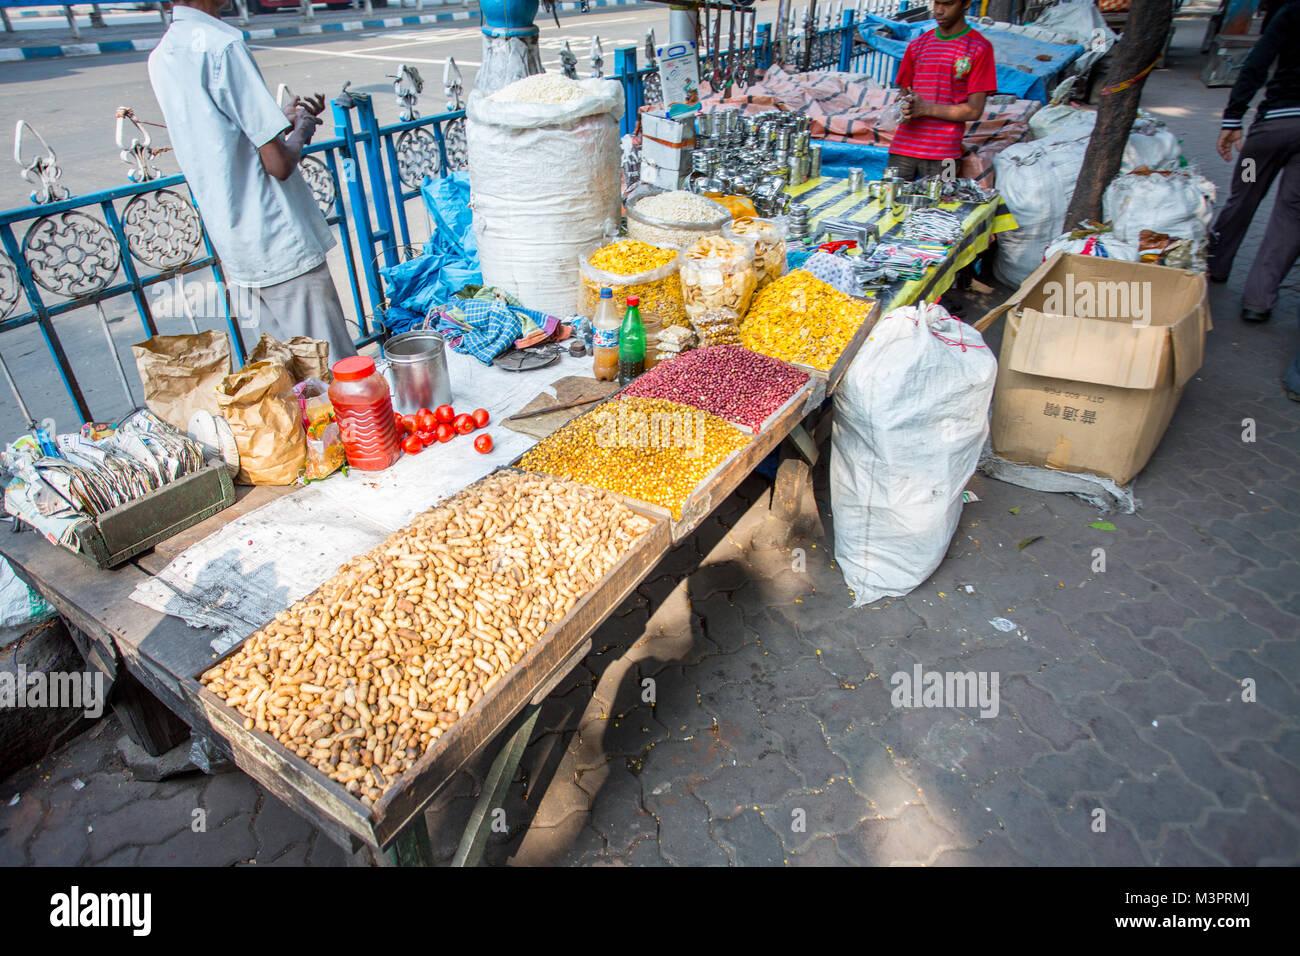 A Market Stall in Kolkata, India - Stock Image